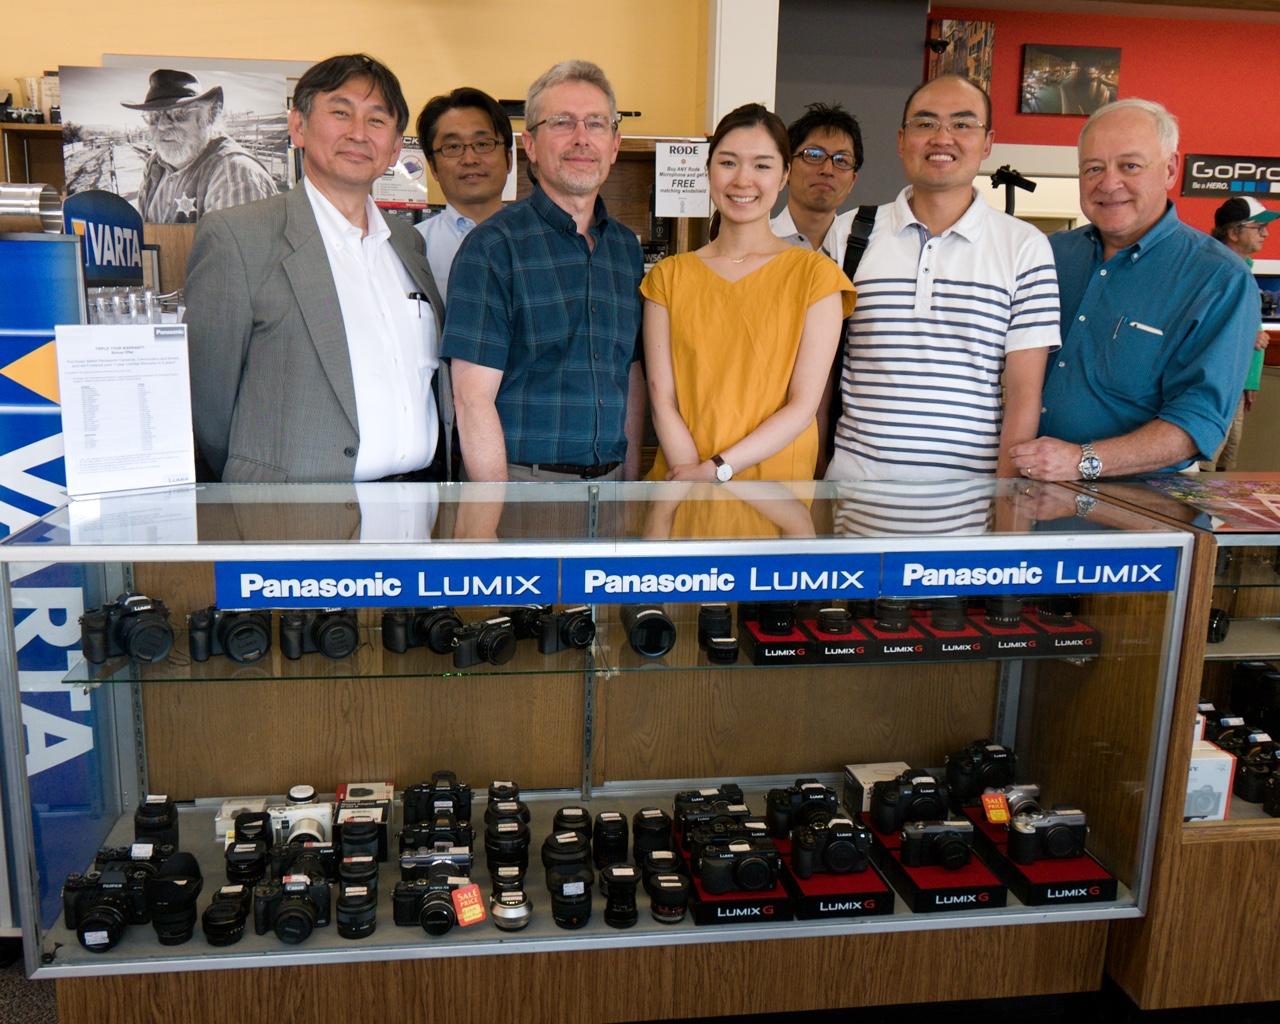 Panasonic Lumix Engineers Visit Bozeman